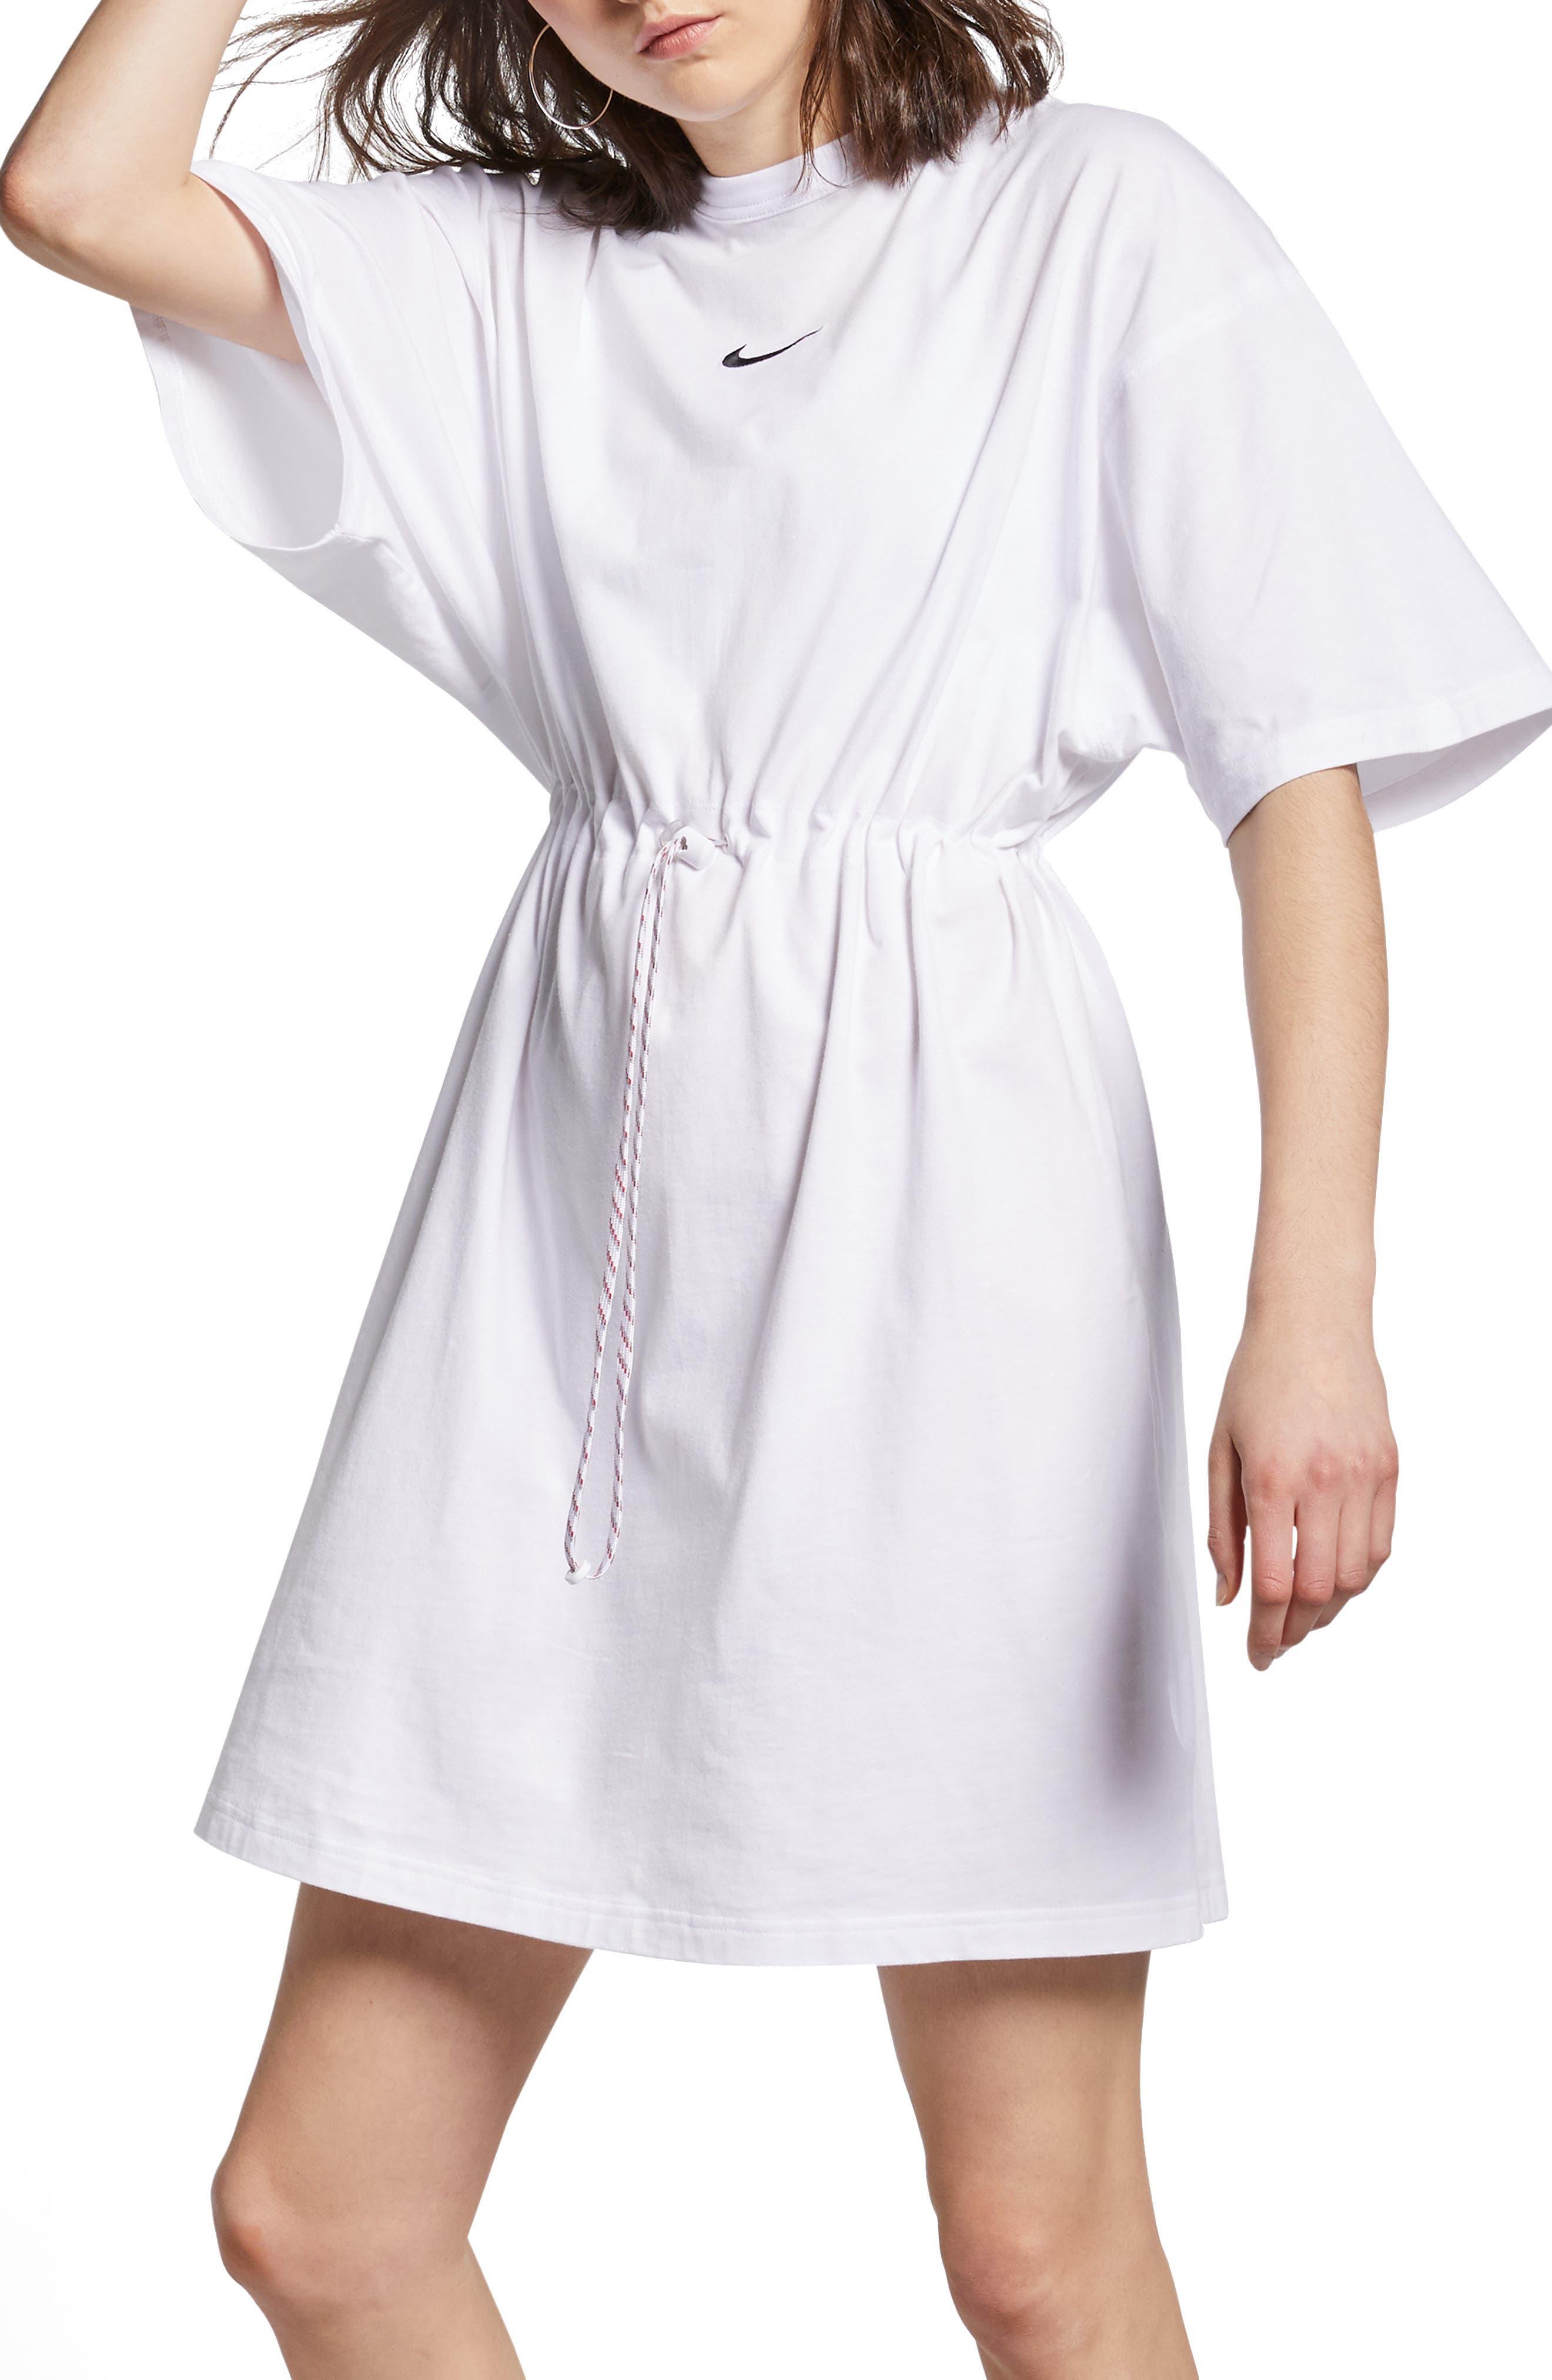 Nike Nikelab Collection Dress, White